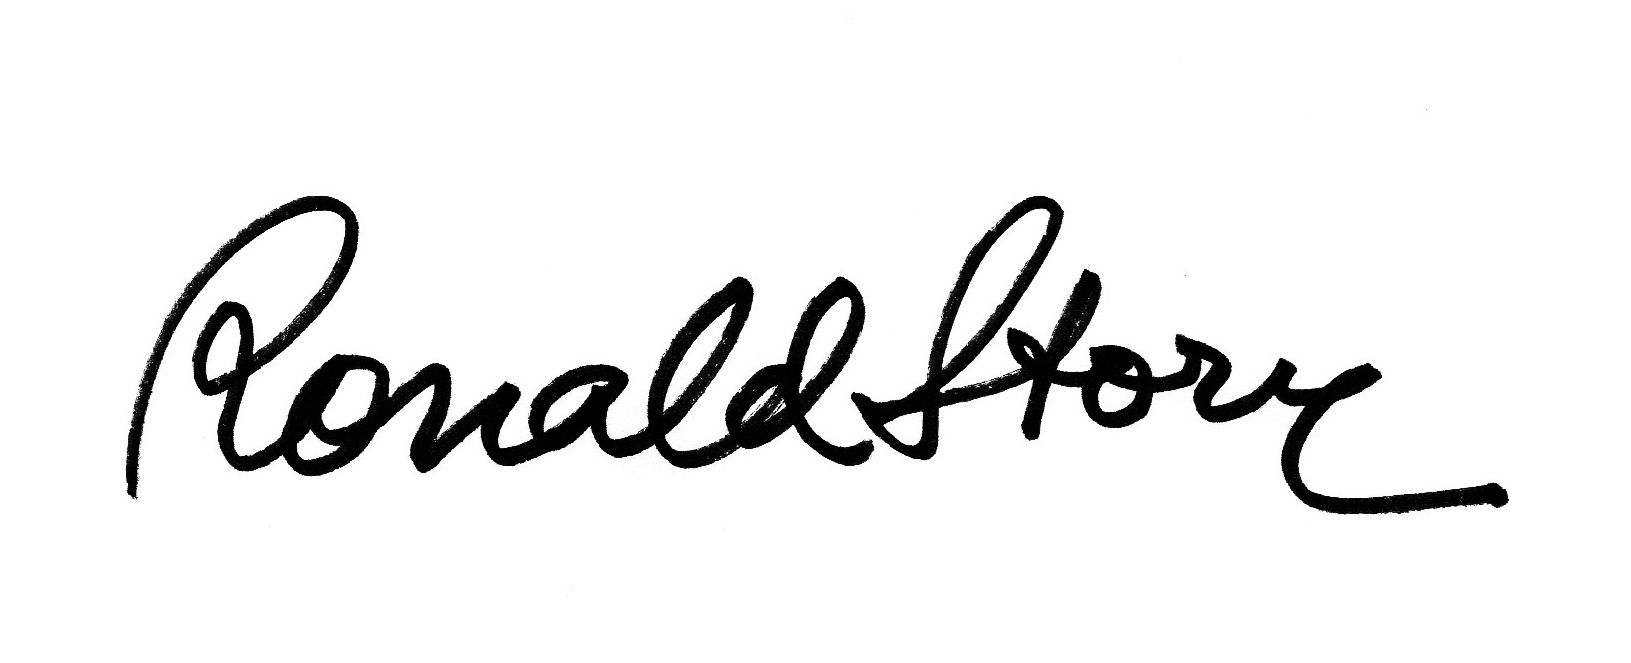 RONALD STORY's Signature